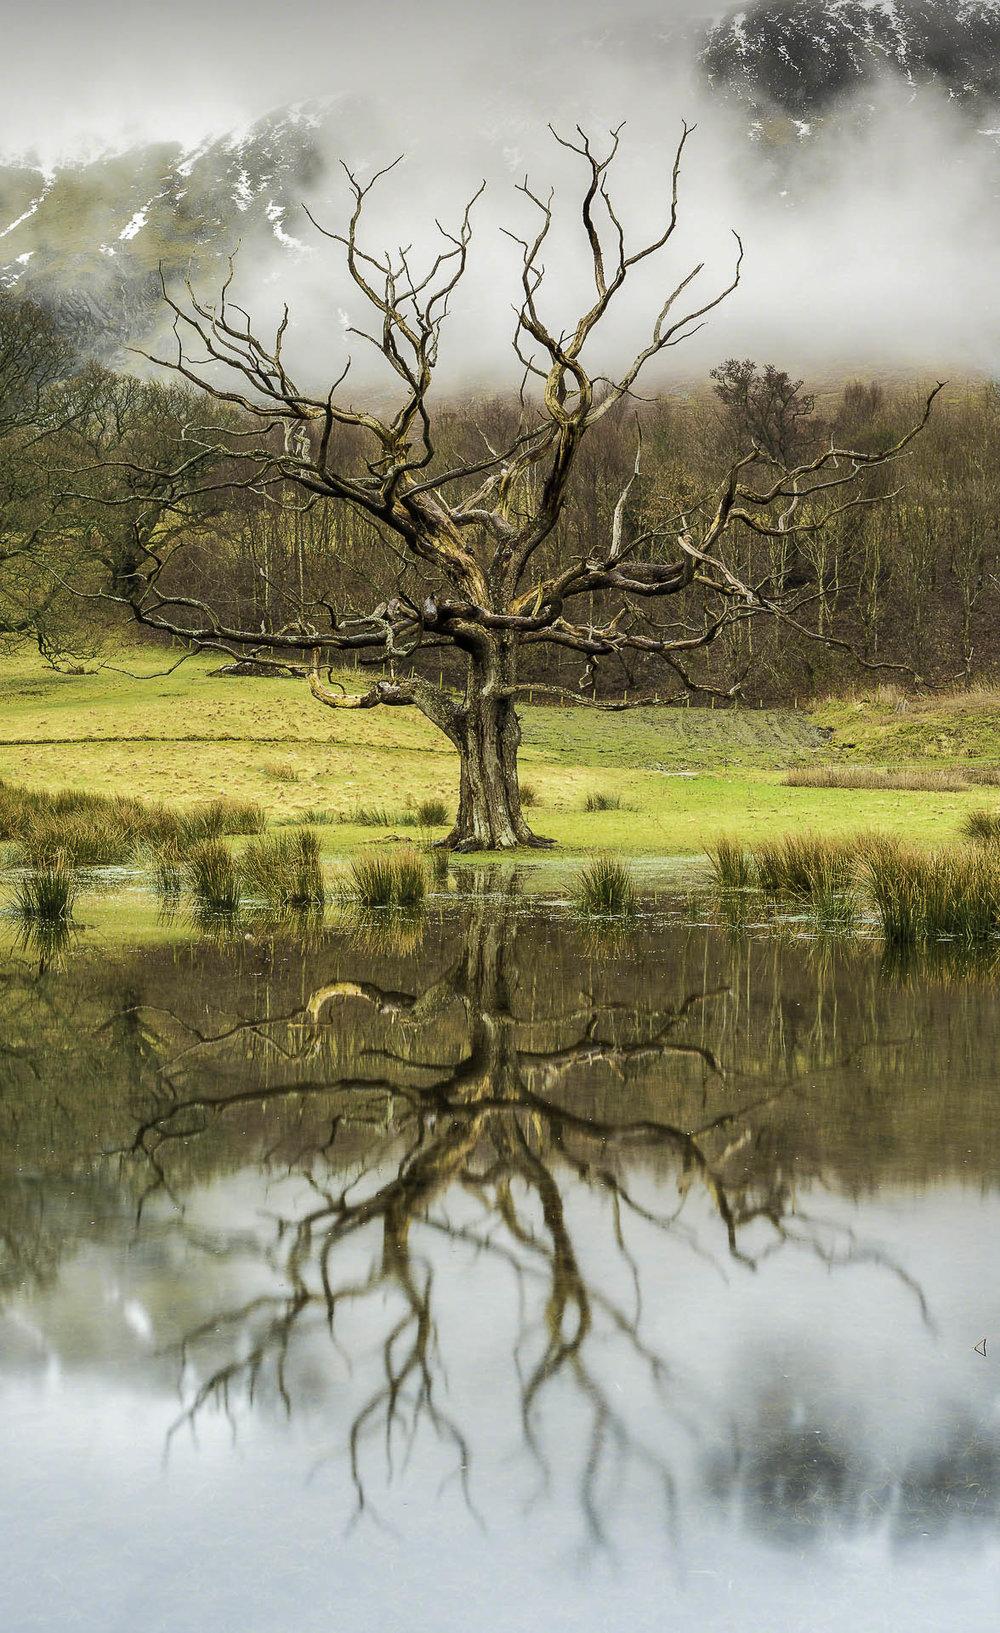 The Lifeless Tree - Blog Image 4x12.jpg